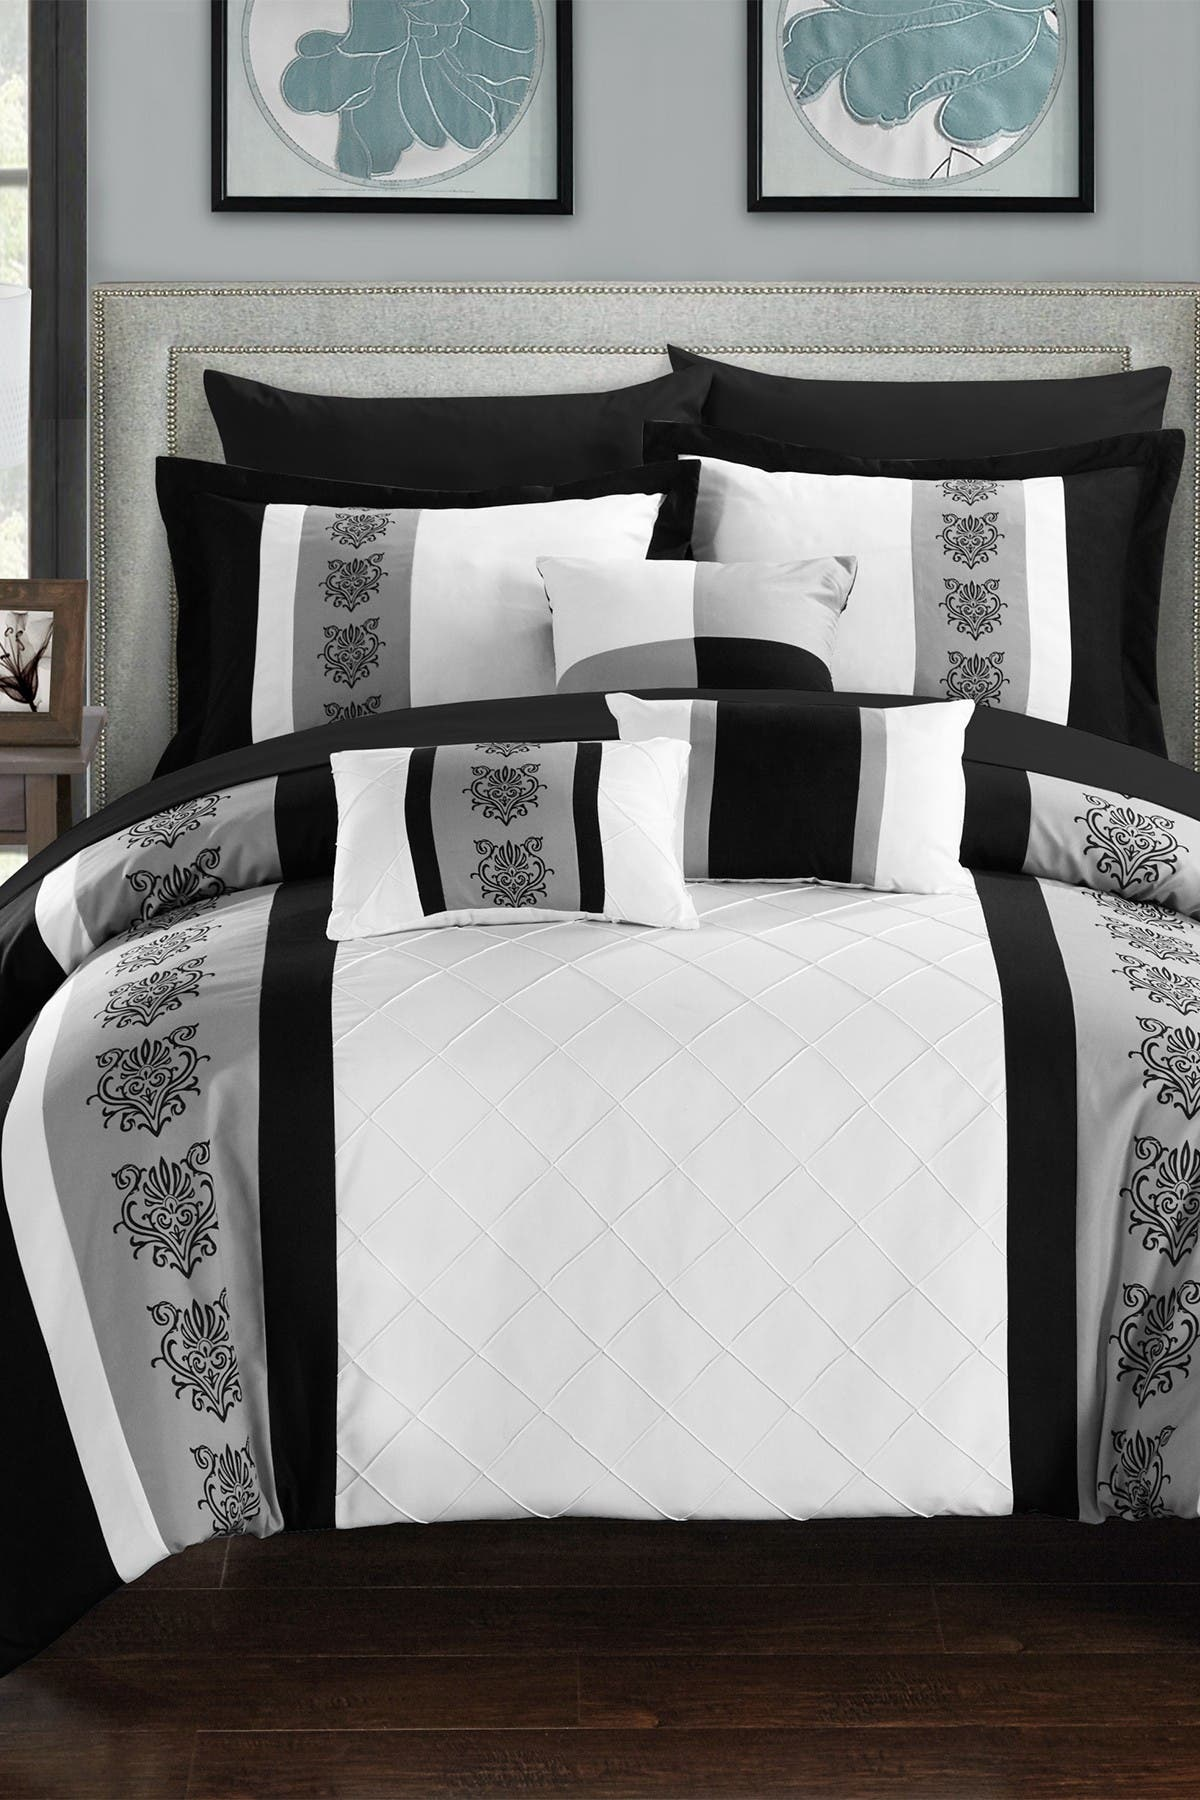 Chic Home Bedding Queen Adam Pintuck Pieced Color Block Embroidery Comforter 10 Piece Set White Nordstrom Rack